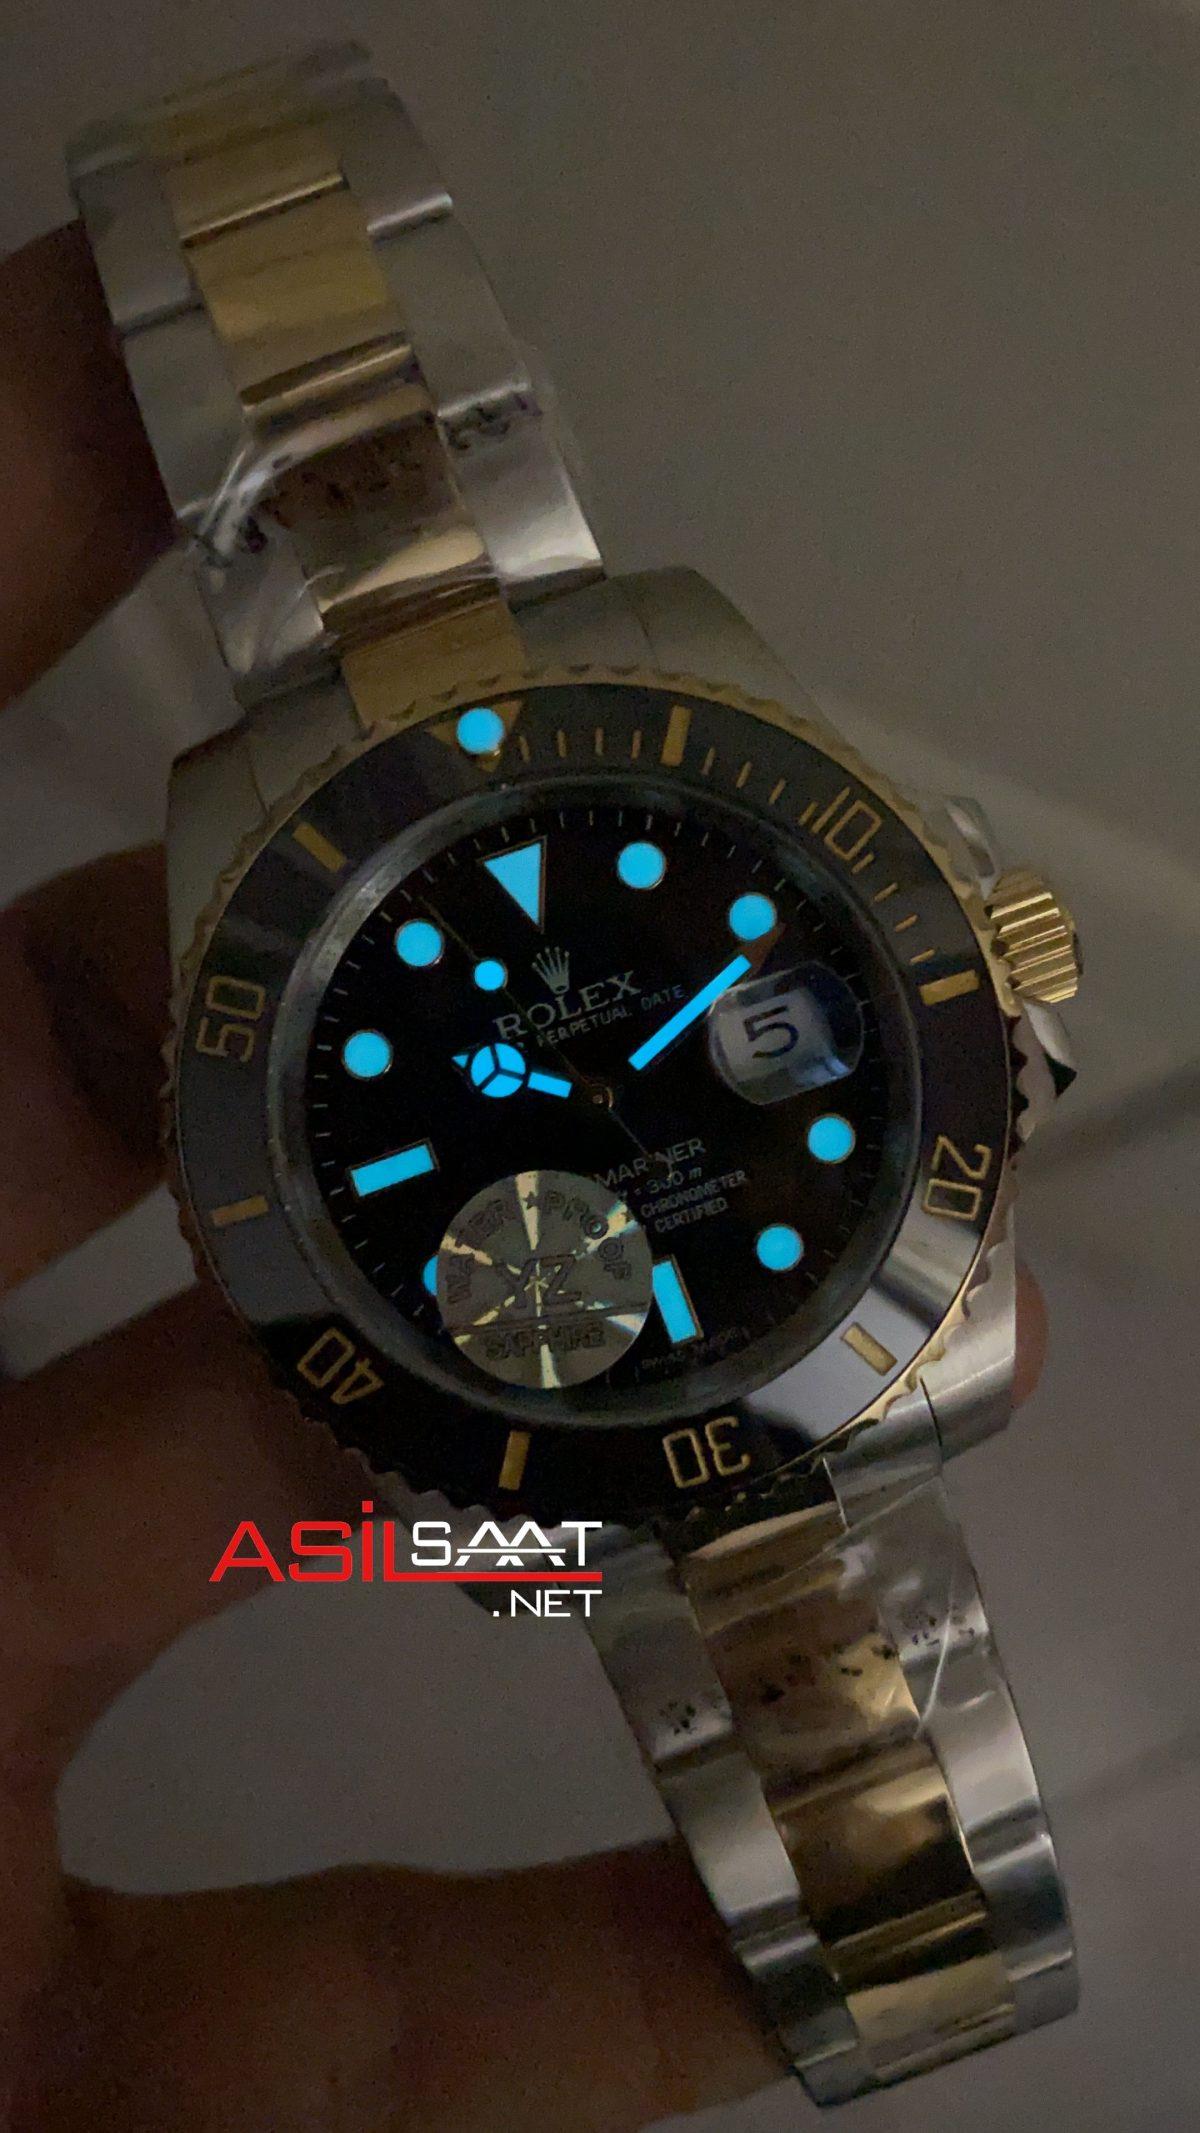 Rolex Submariner 116613 LN ROLS006